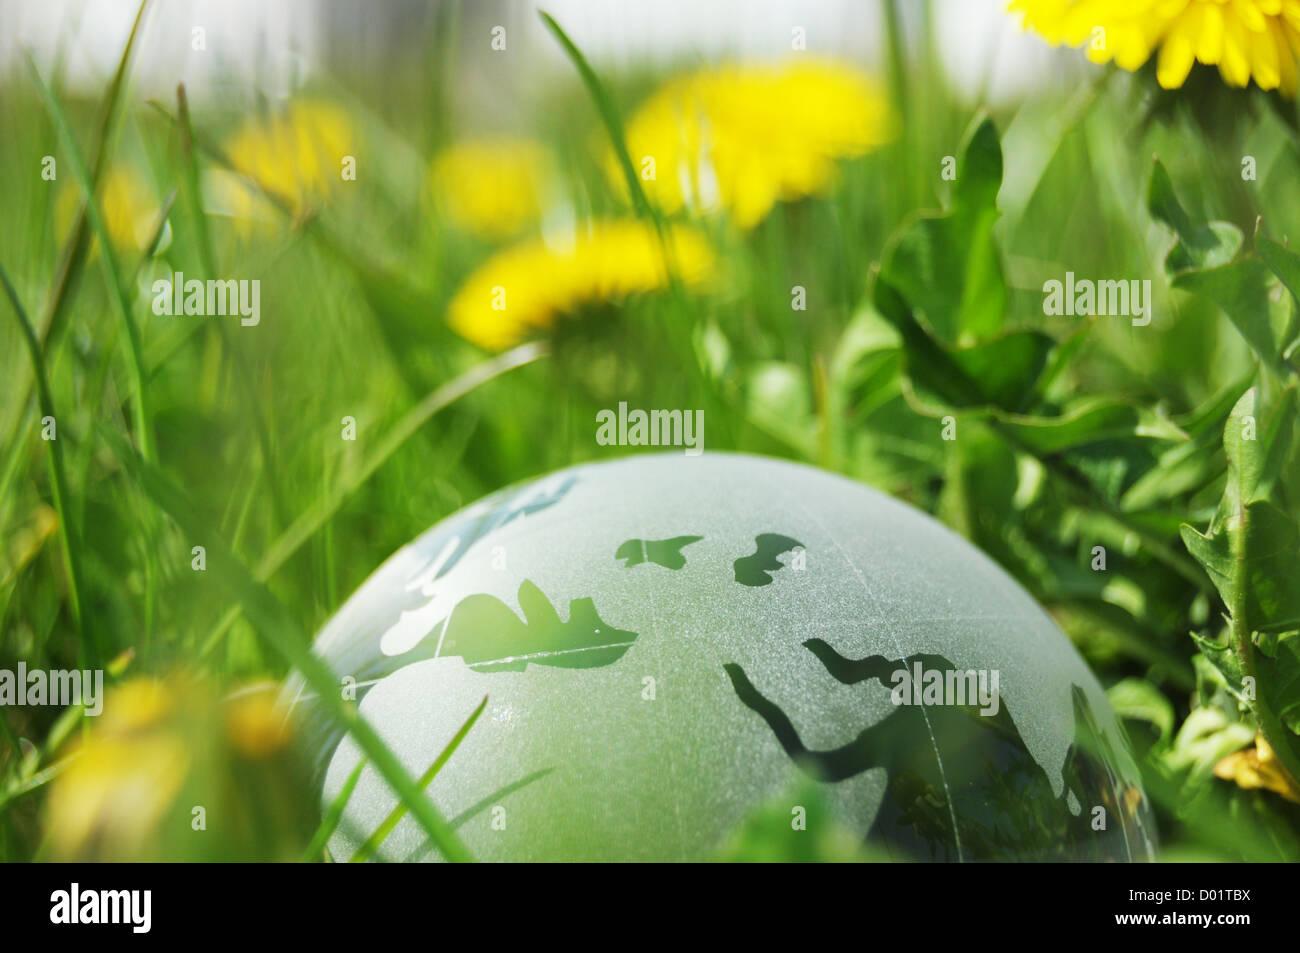 Glaskugel oder Erde in Grasgrün mit Eco-Konzept mit Exemplar Stockbild